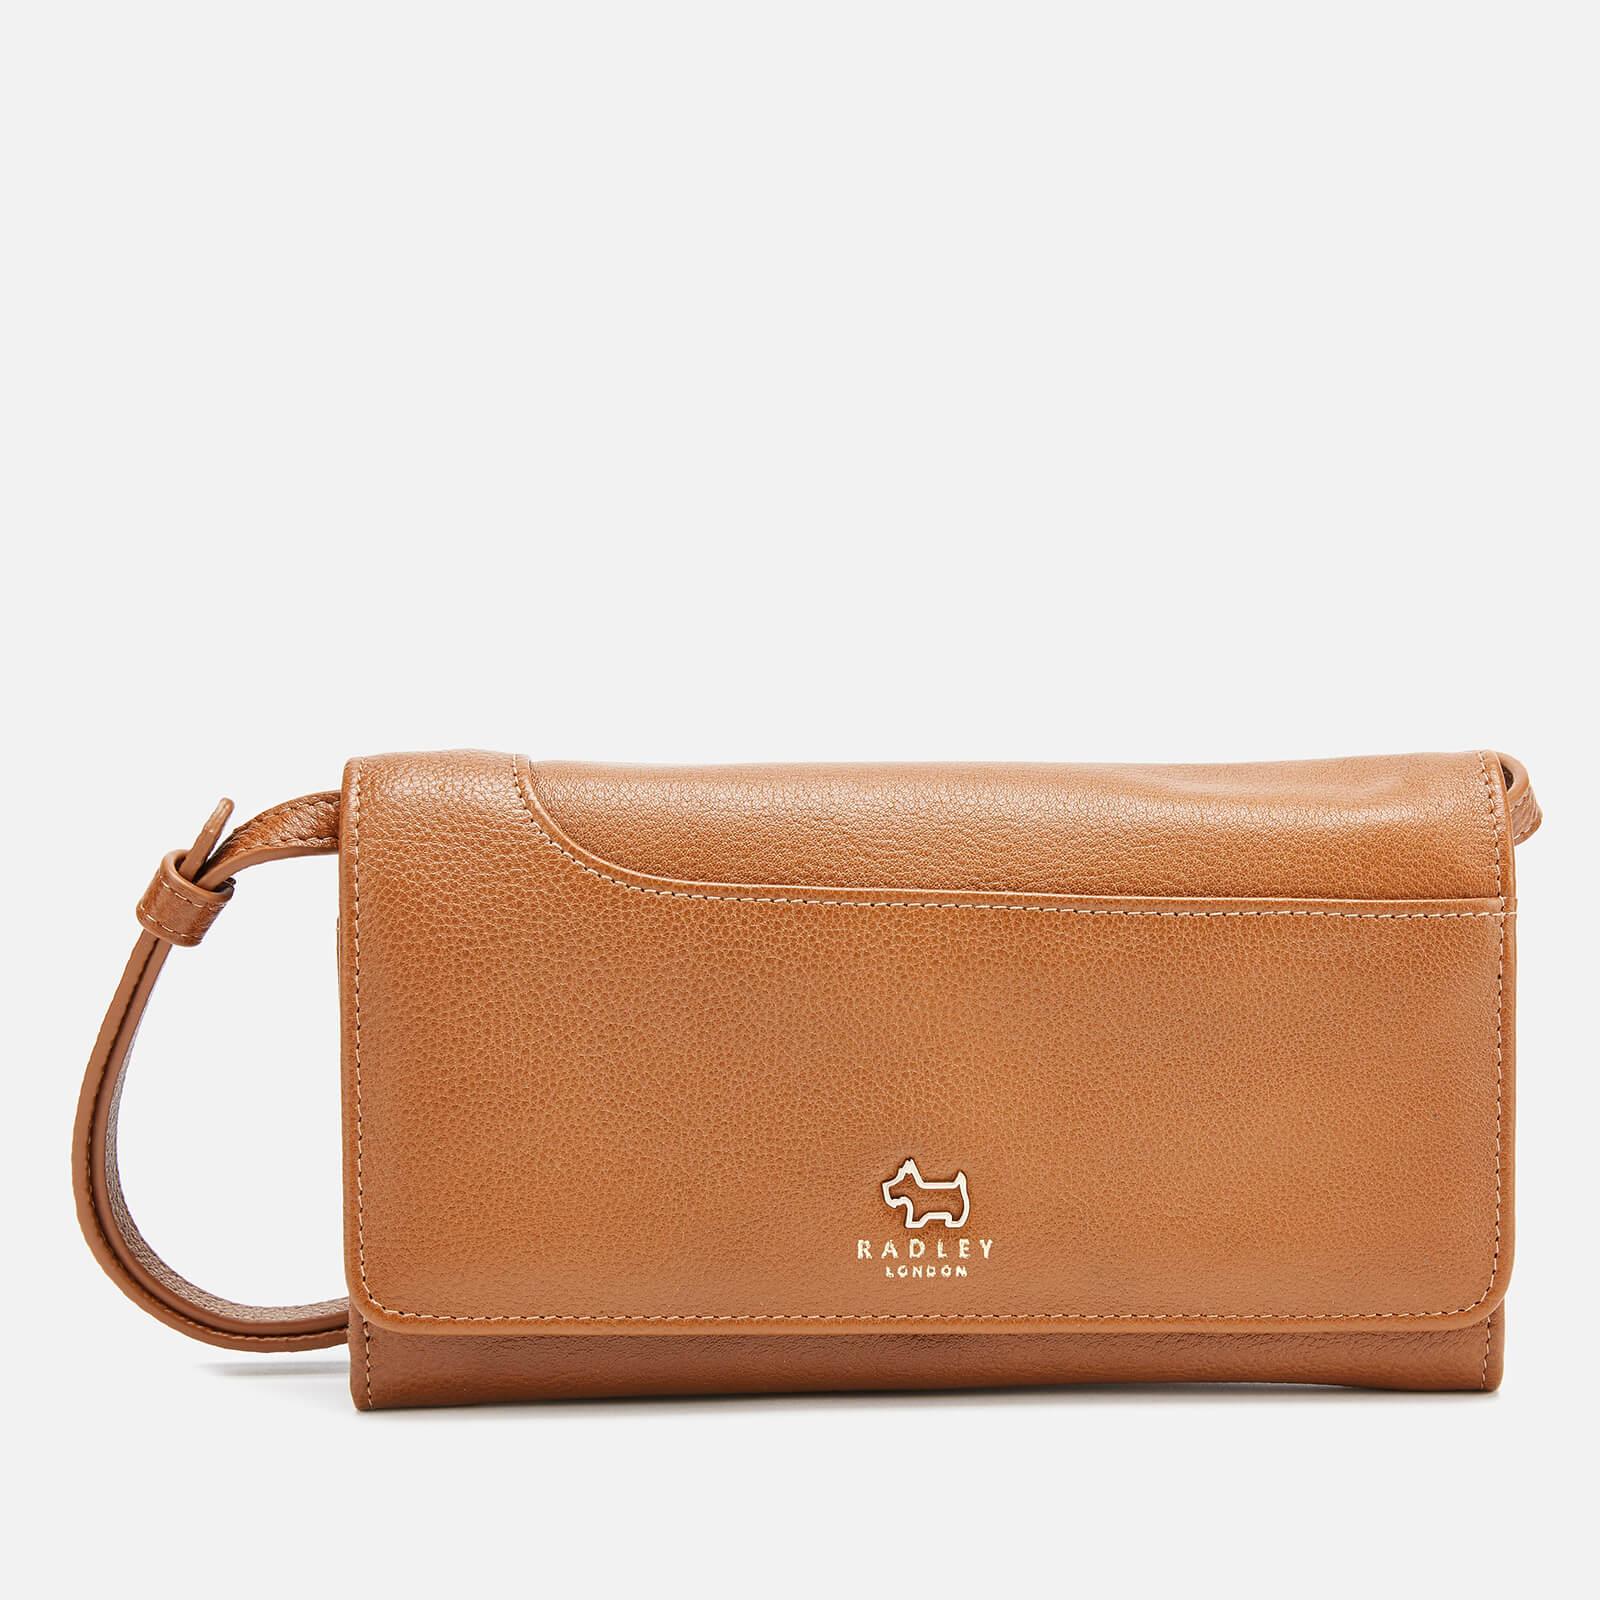 Radley Women's Pockets Large Phone Cross Body Bag - Honey